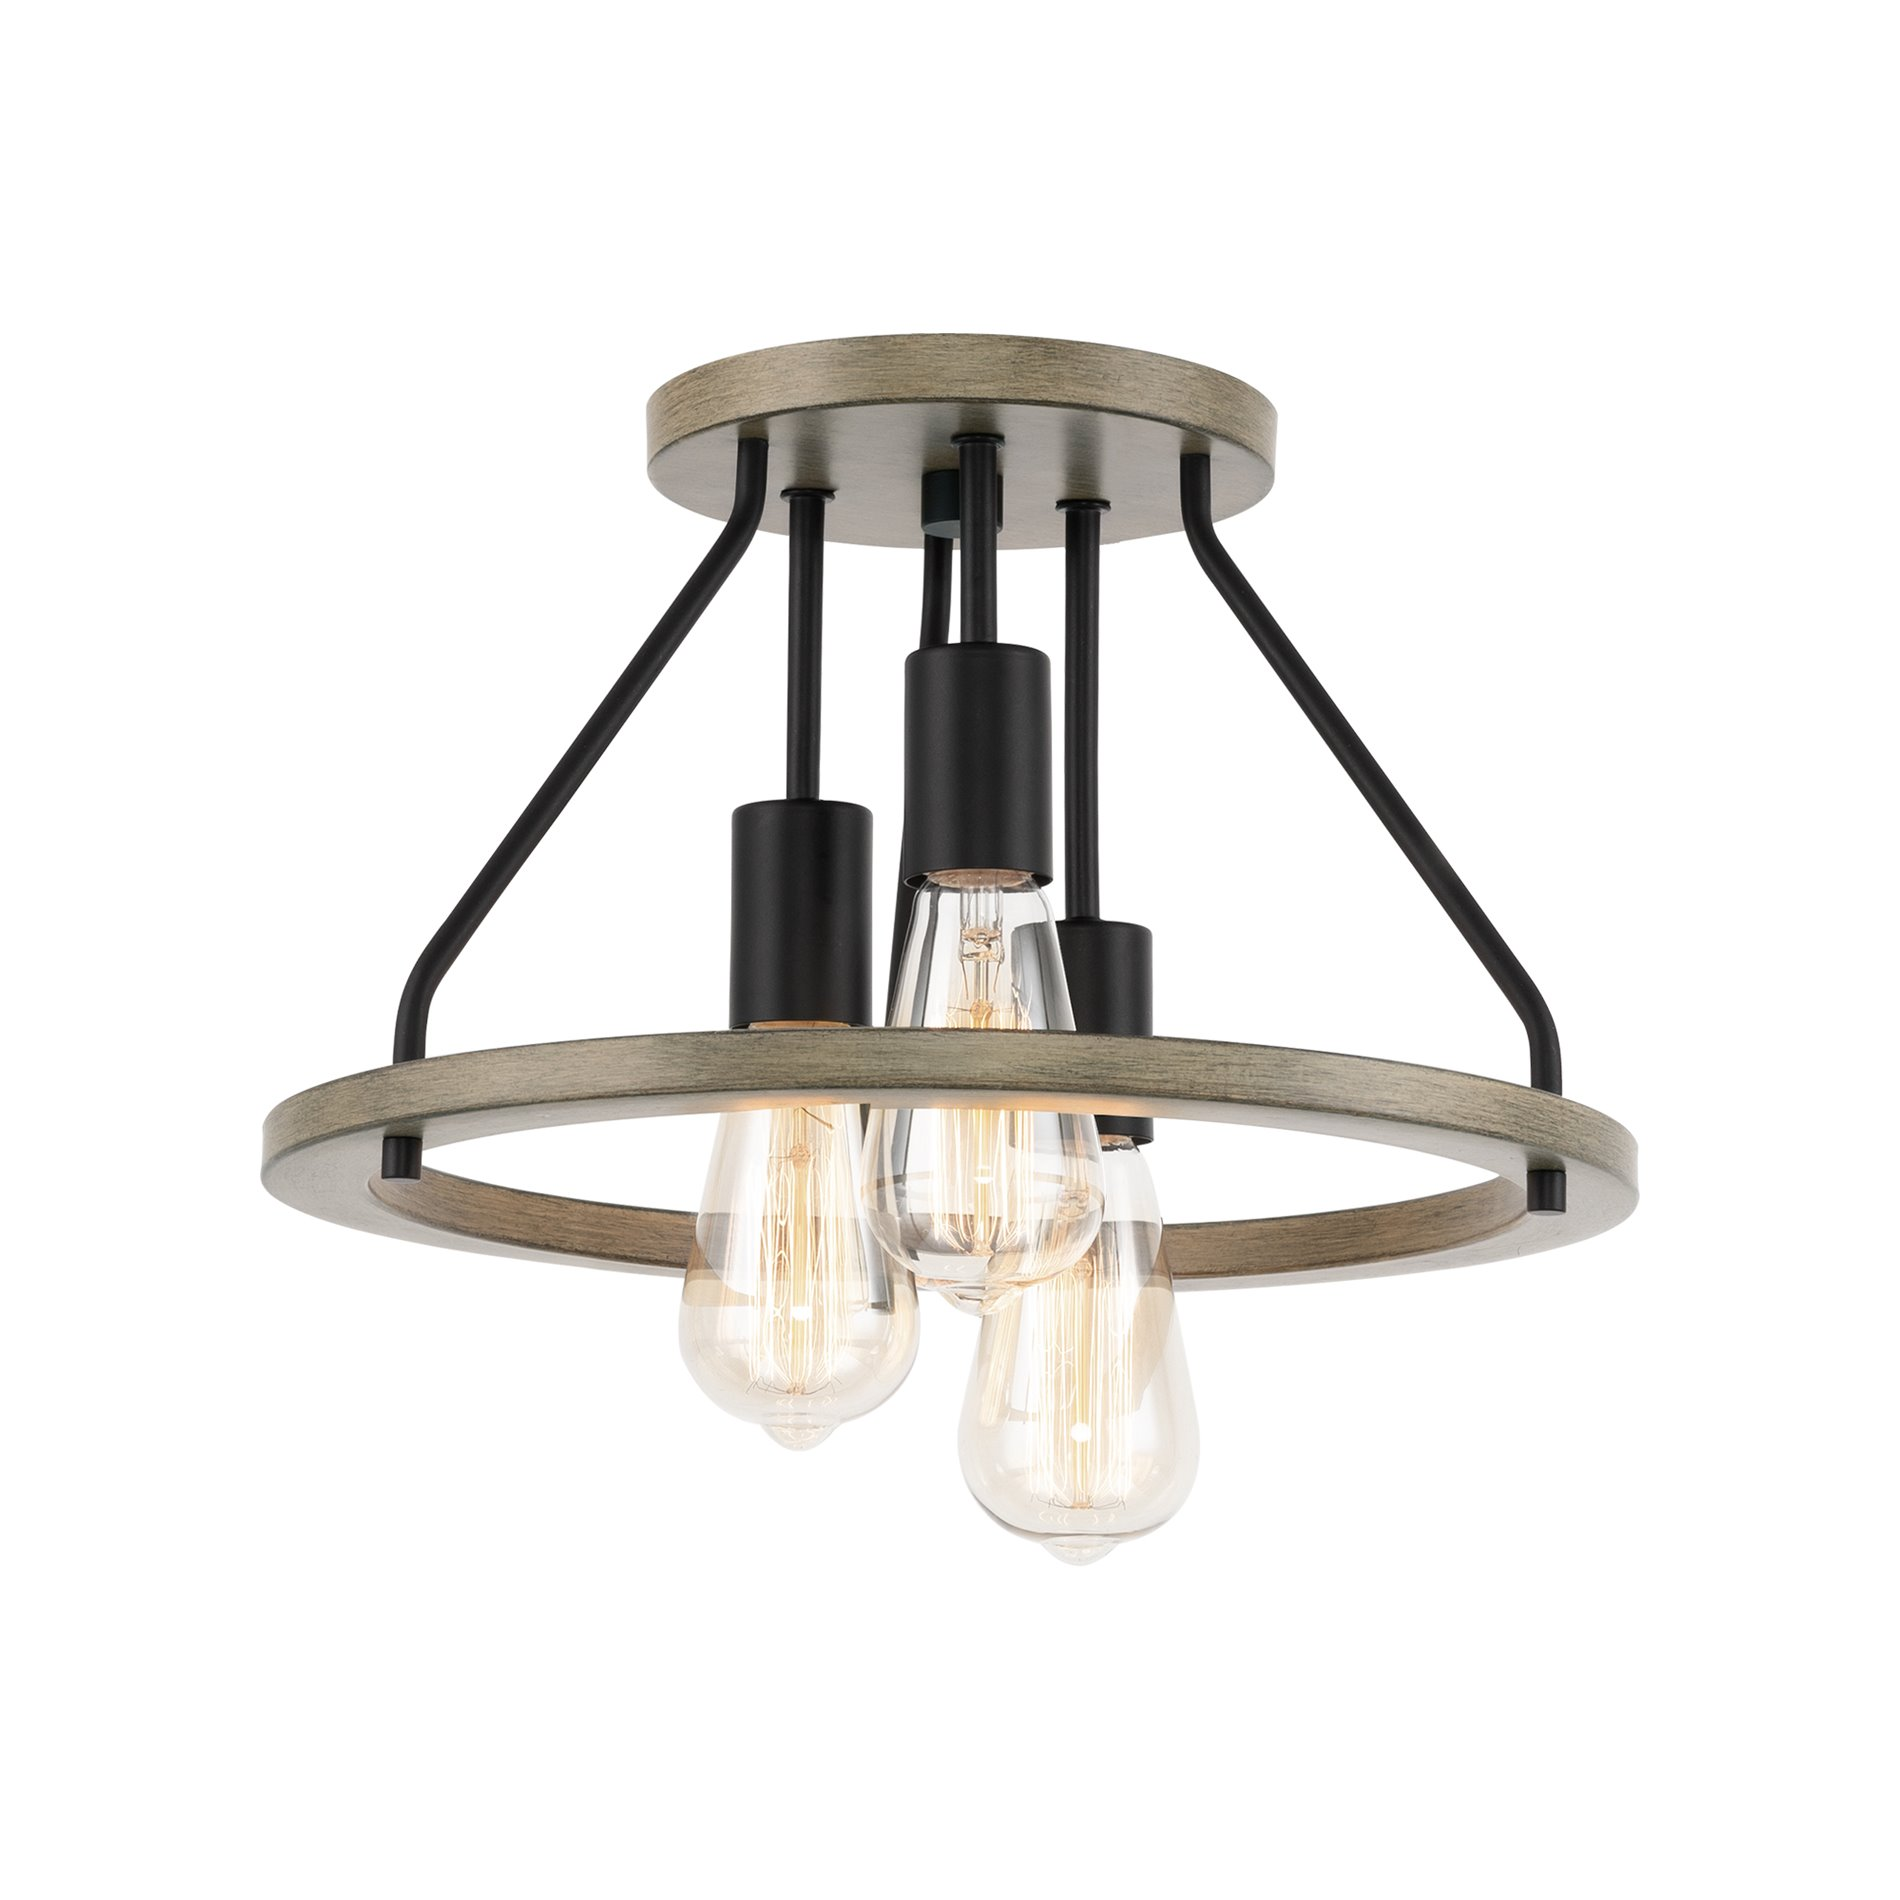 kira home sullivan 14 3 light rustic farmhouse flush mount ceiling light metal shade smoked birch wood style black walmart com